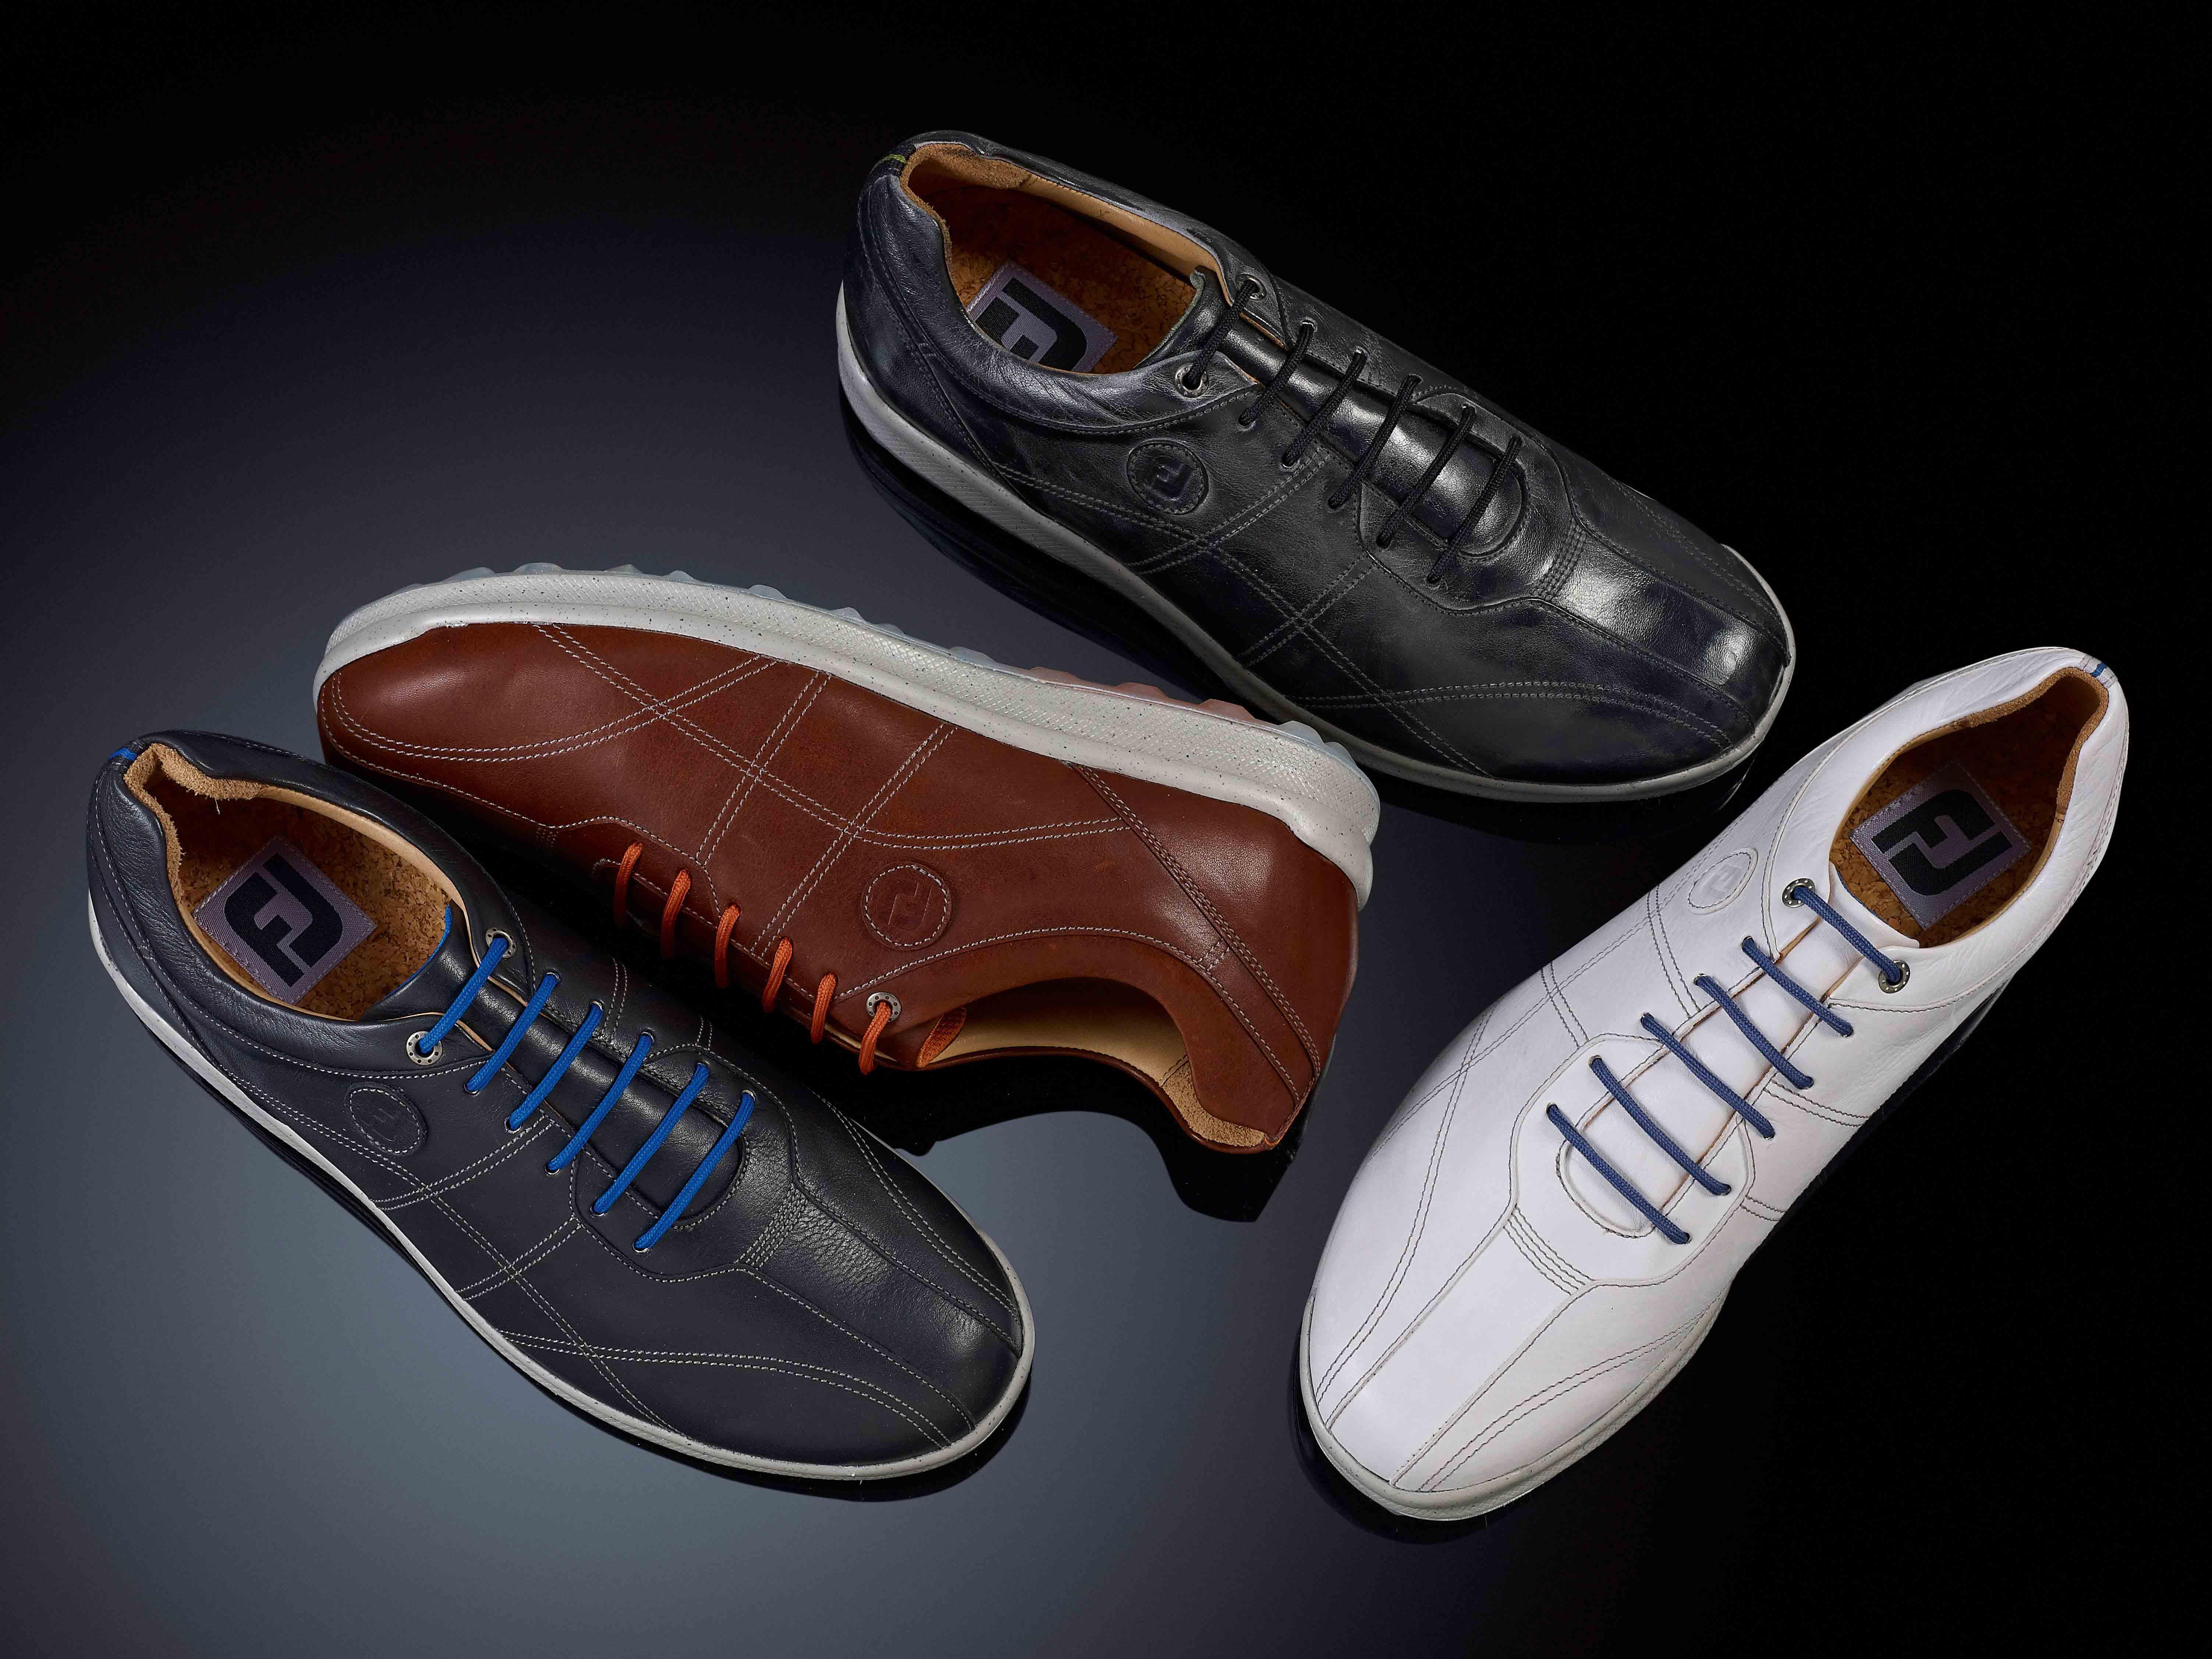 4f4e19321 FootJoy VersaLuxe shoe unveiled